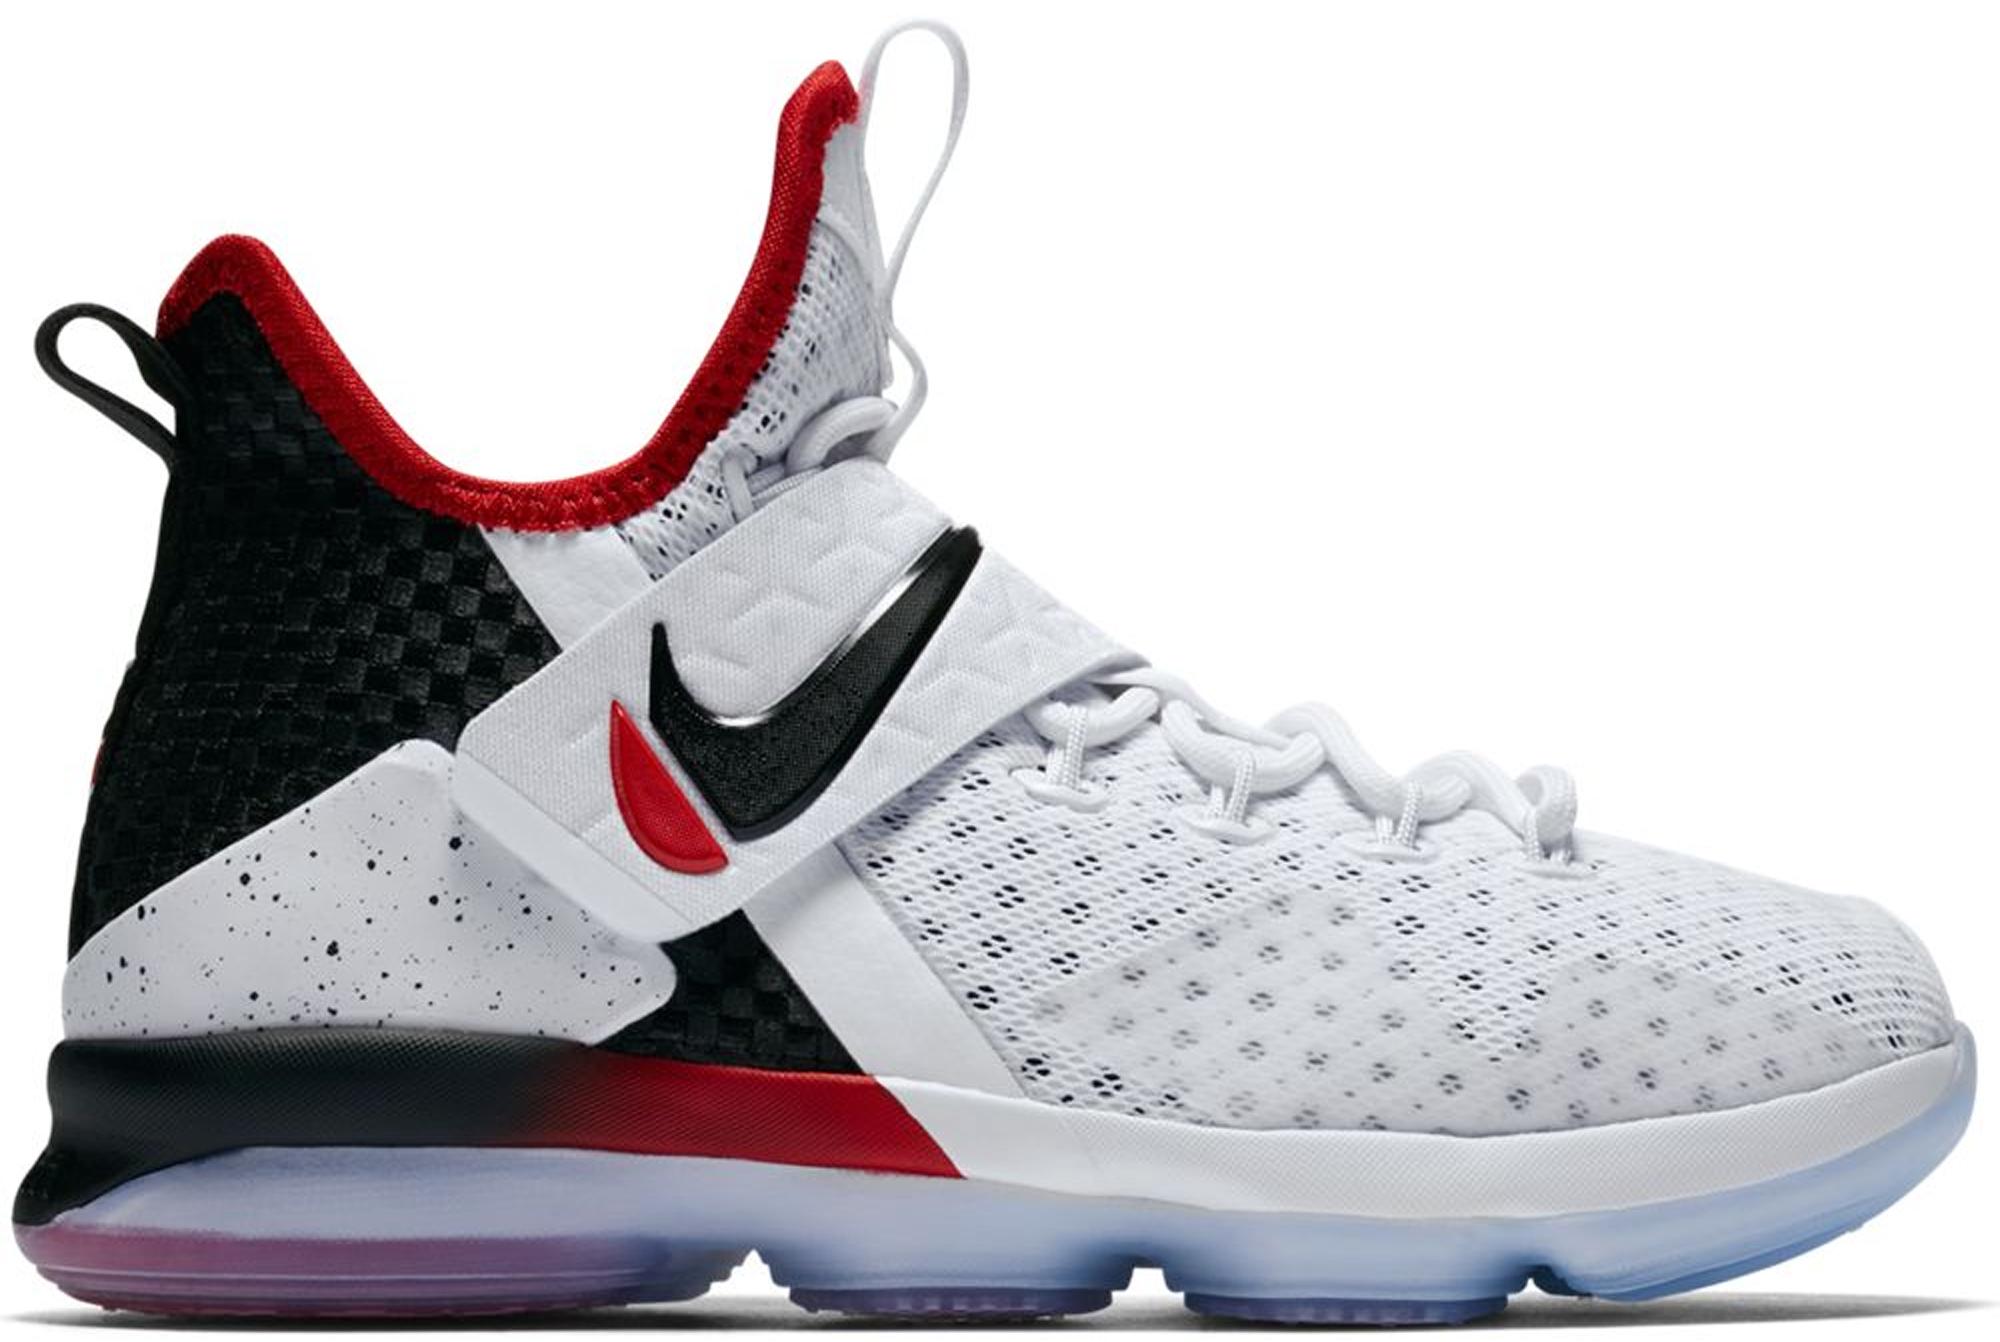 Nike LeBron 14 Flip the Switch (GS